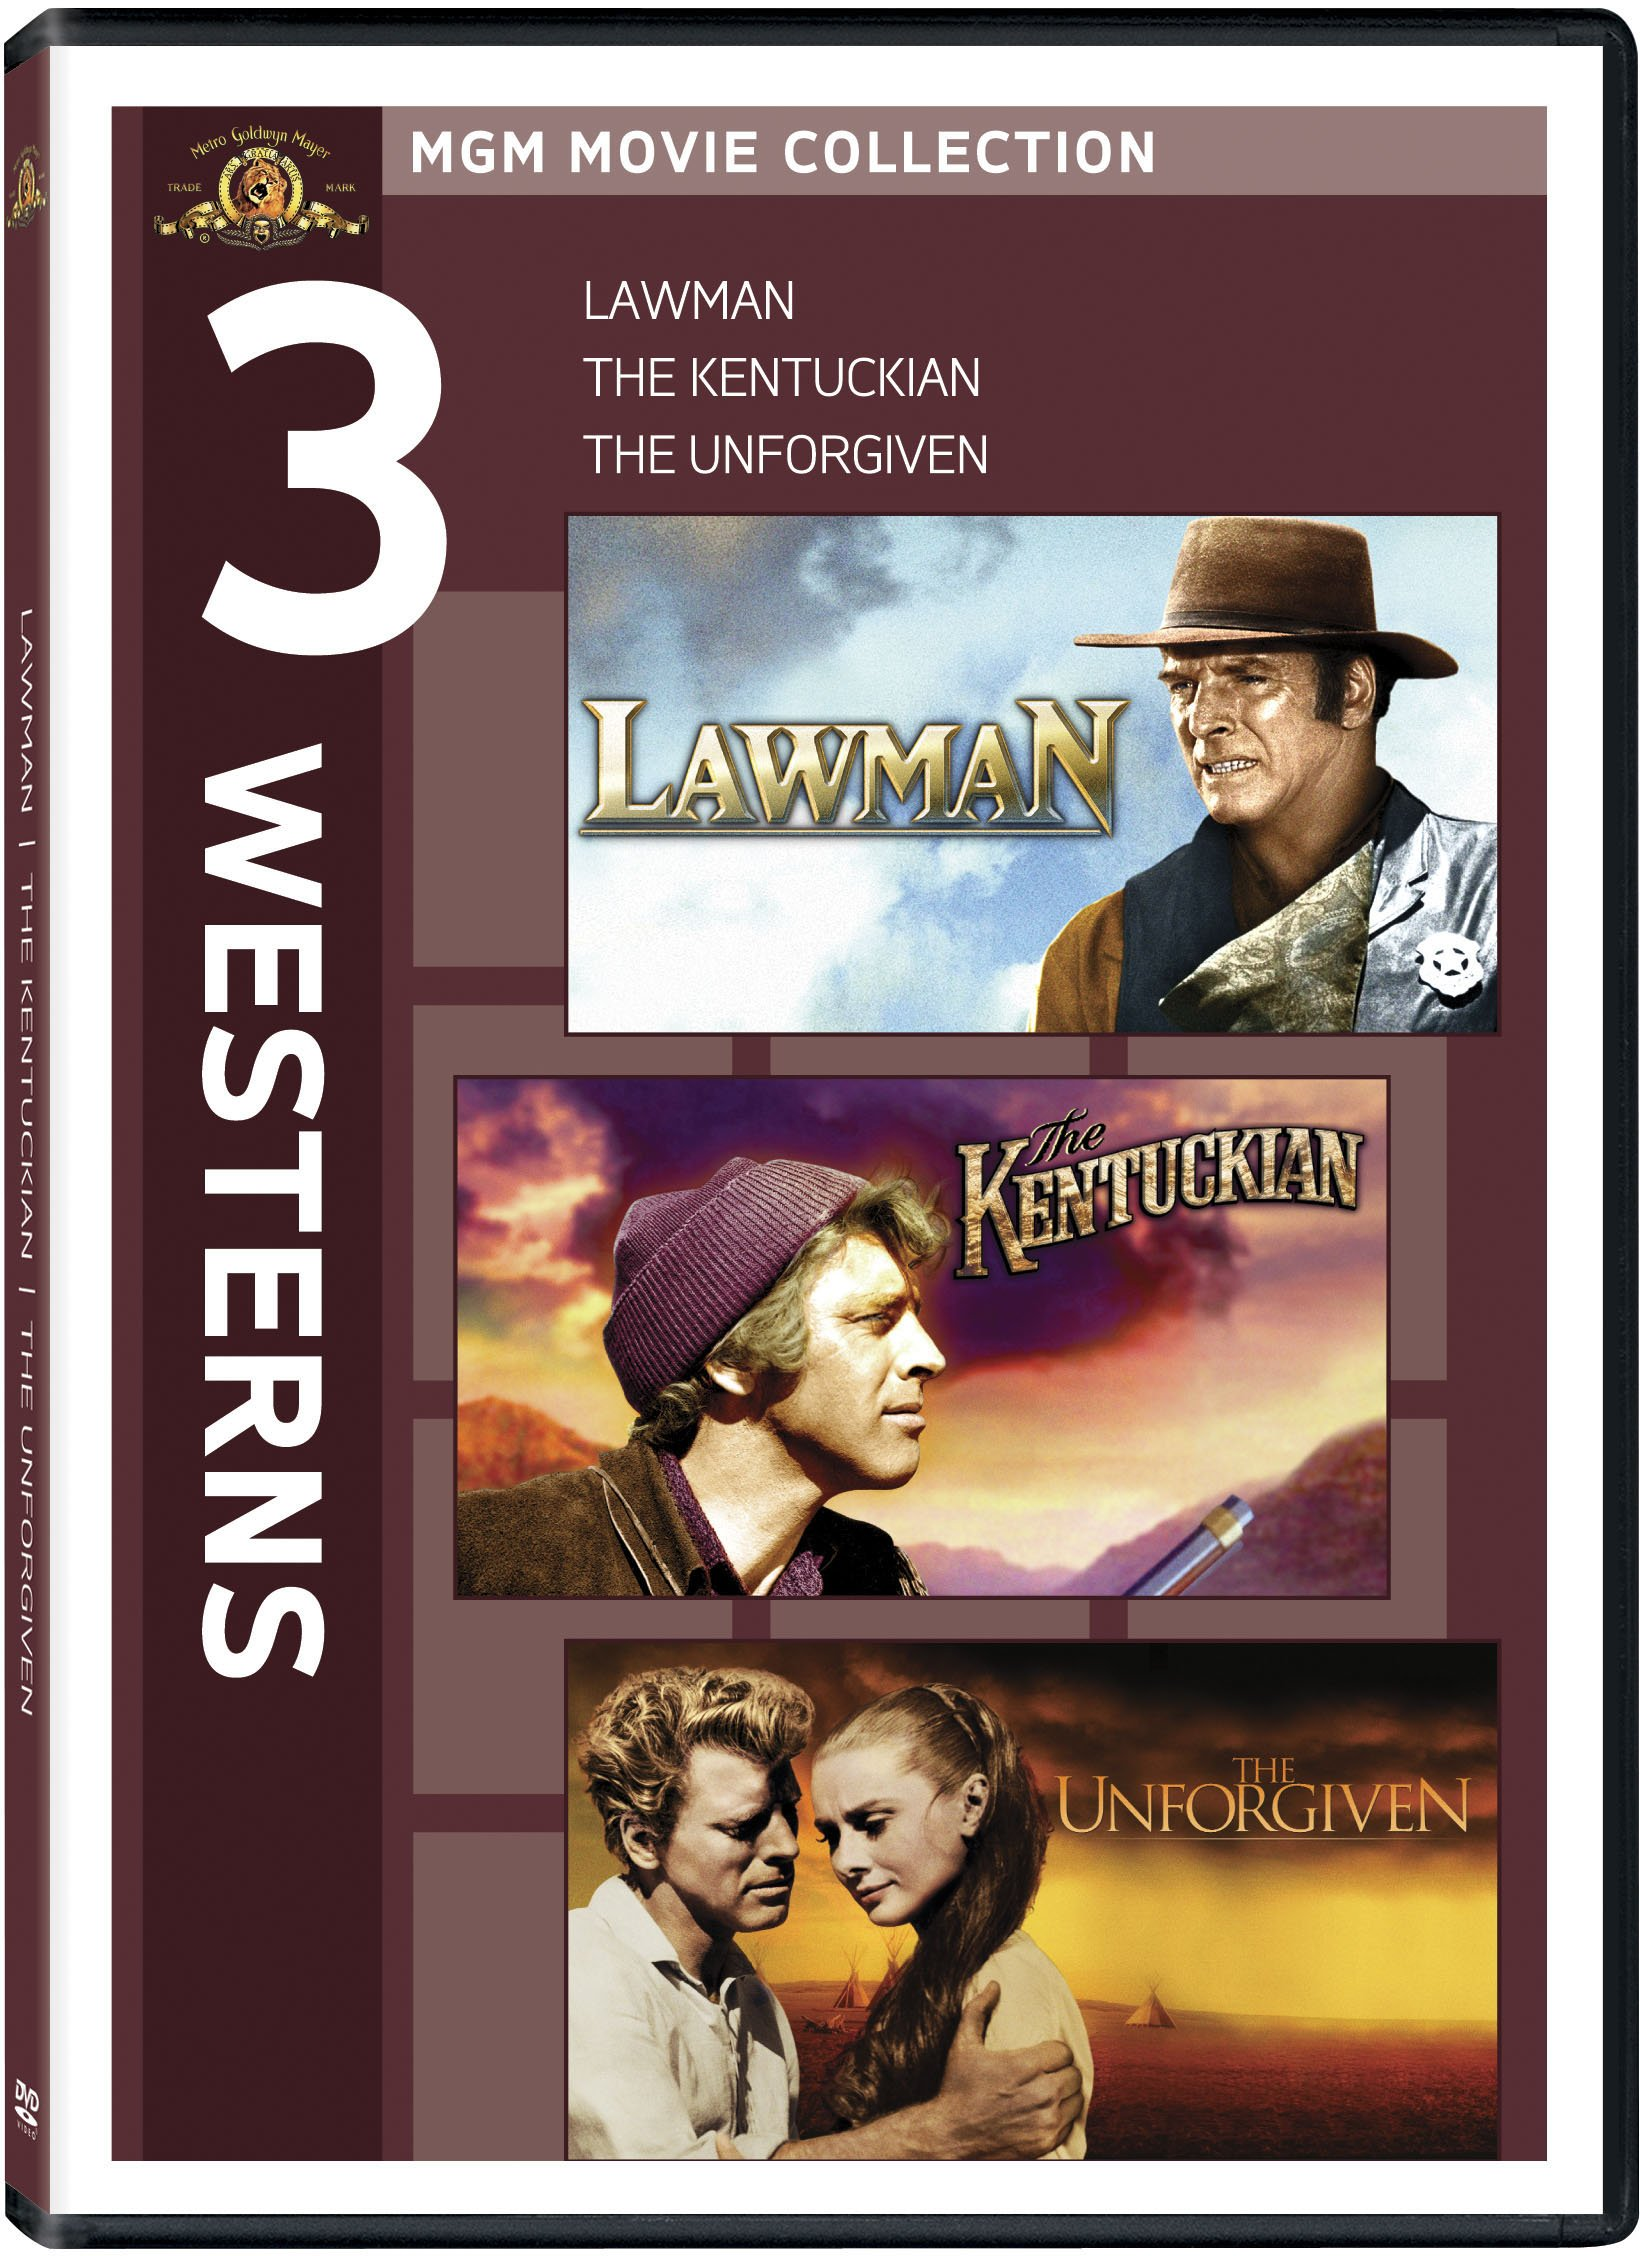 Lawman / The Kentuckian / The Unforgiven